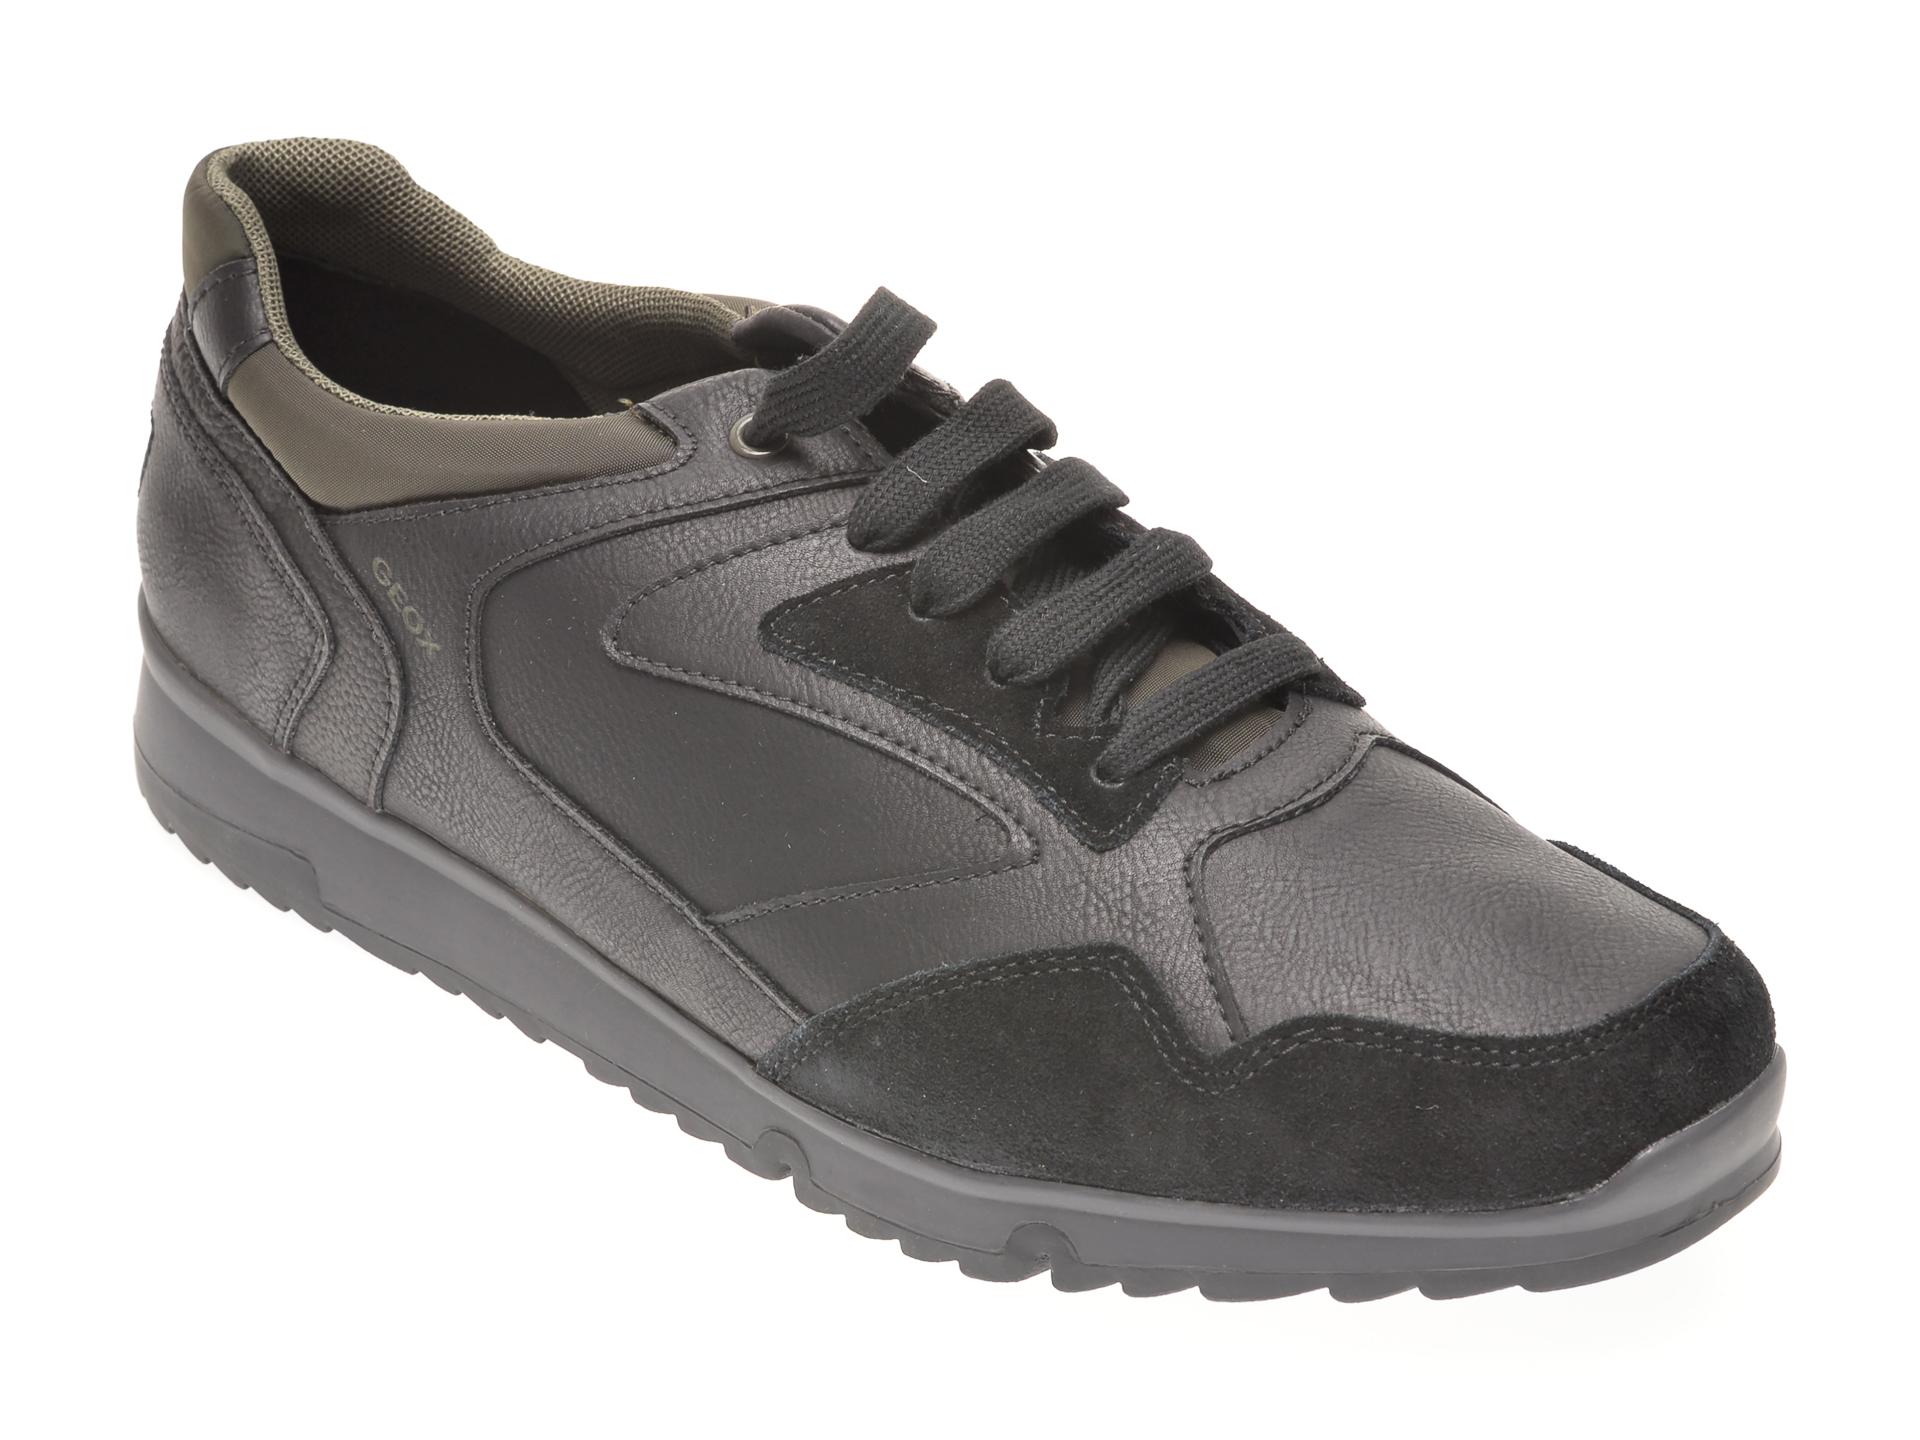 Pantofi GEOX negri, U043XB, din piele ecologica imagine